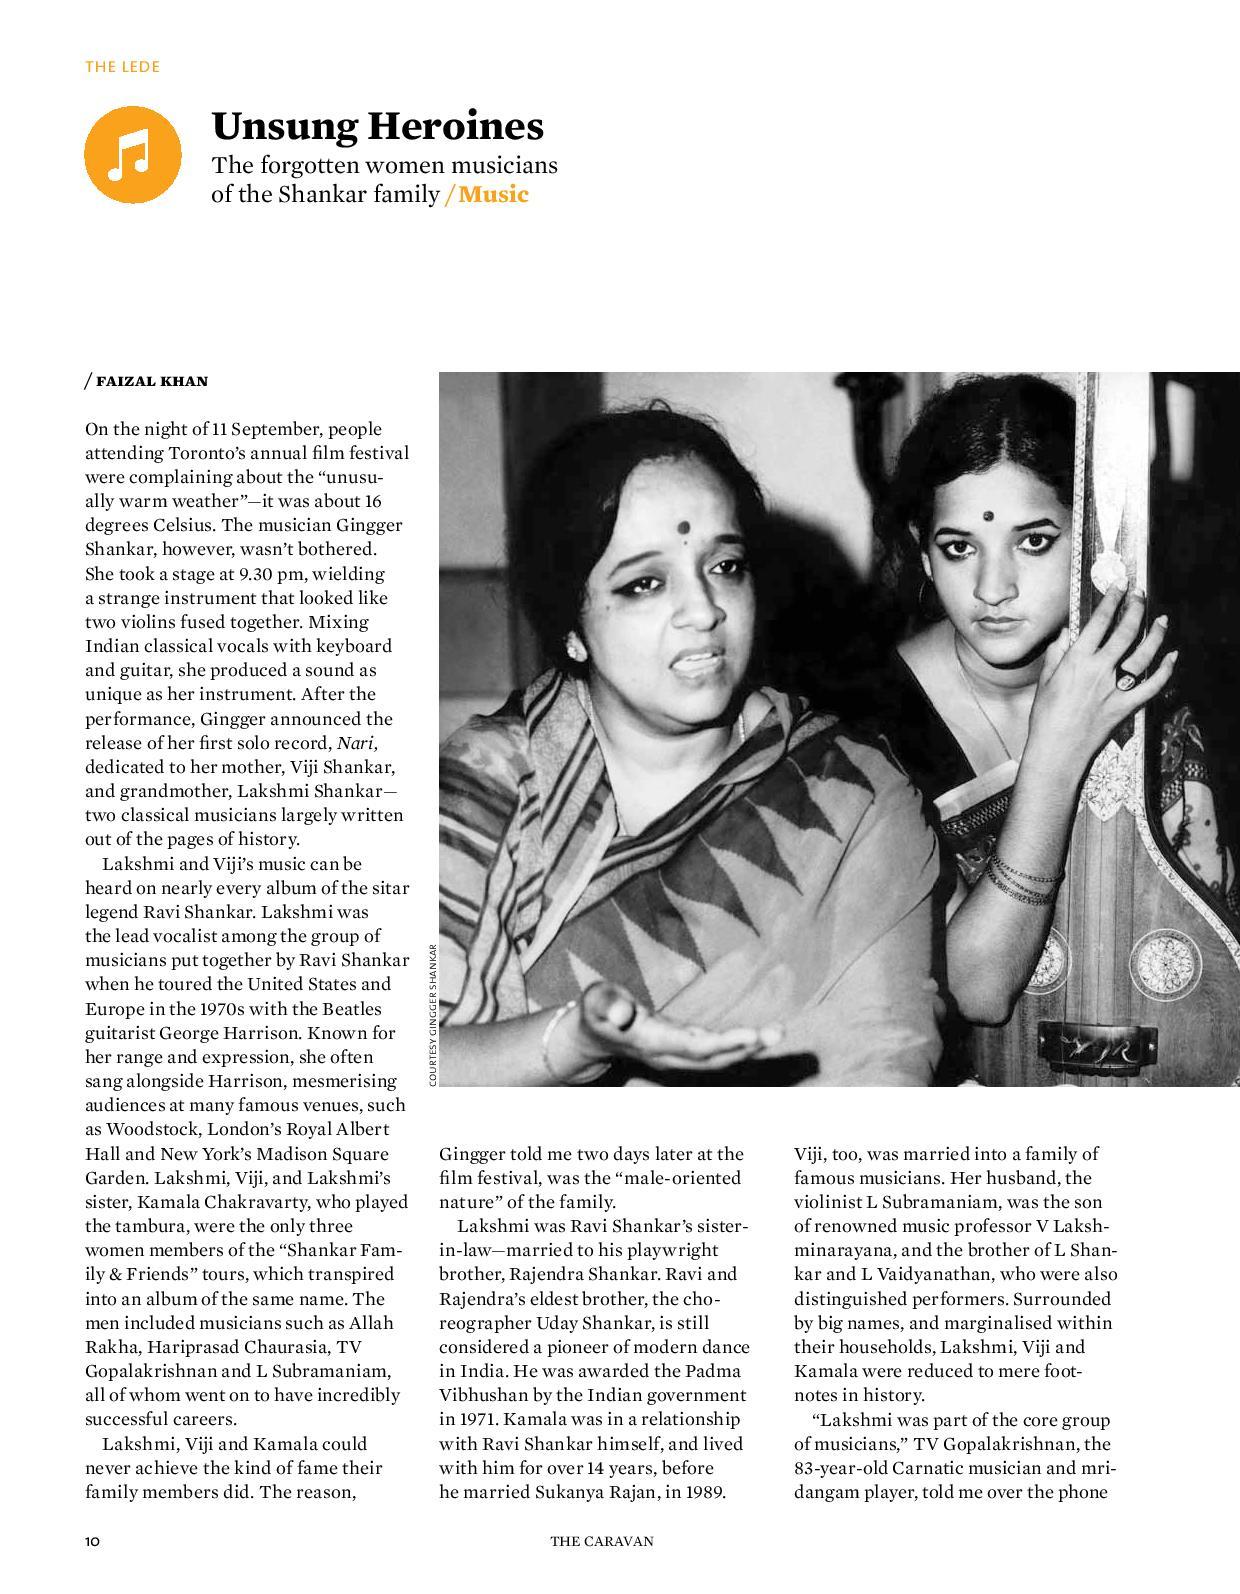 Caravan Magazine: Unsung Heroines